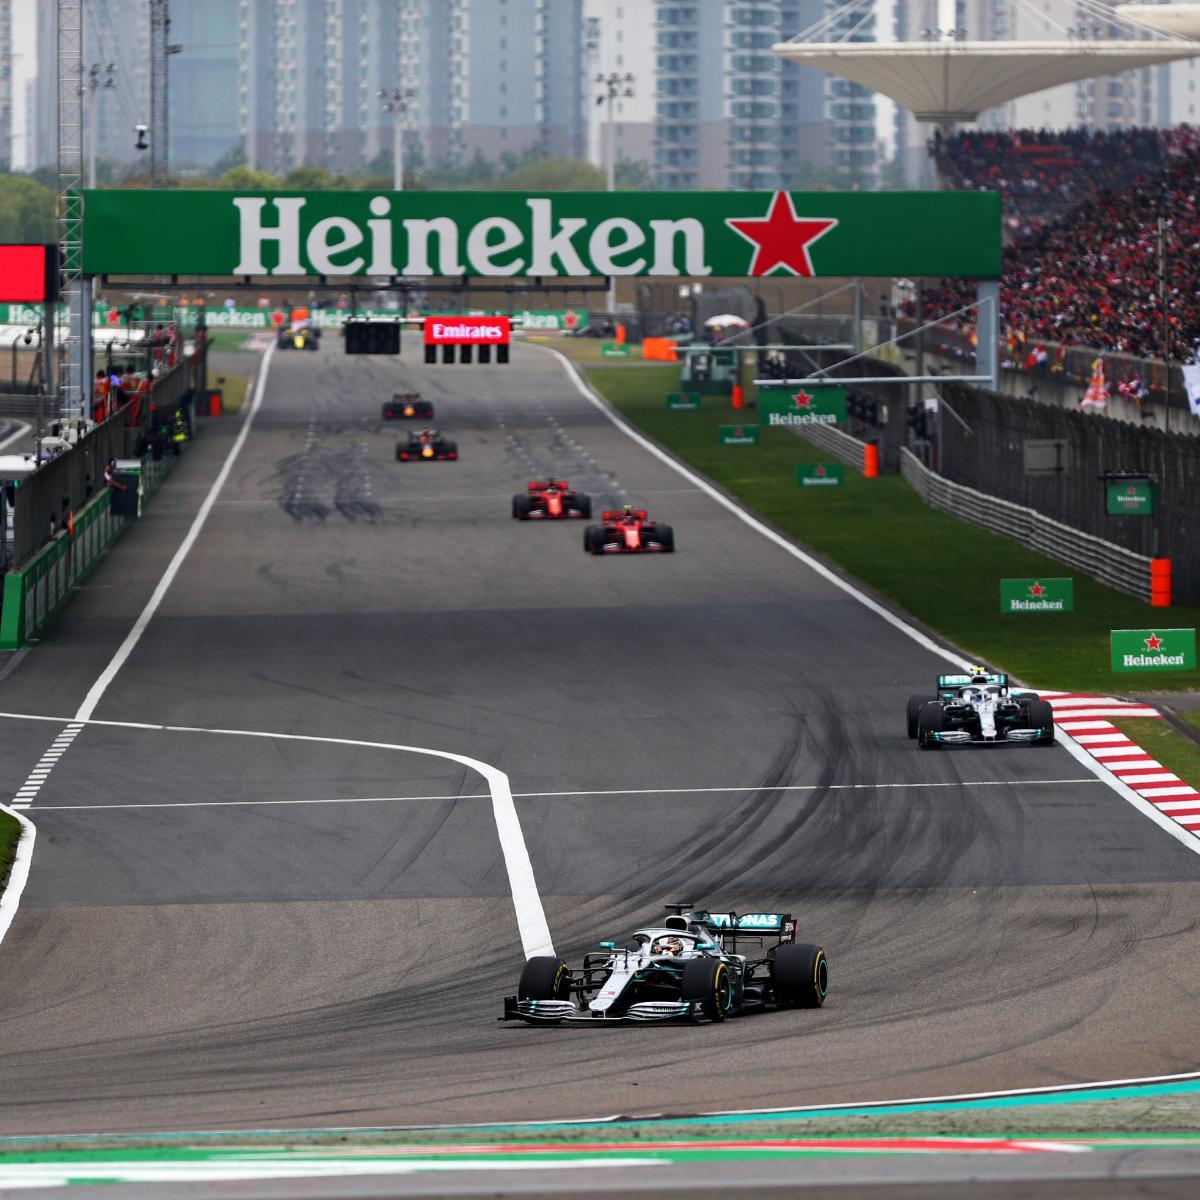 Chinese F1 Grand Prix 2019 Results: Winner, Standings